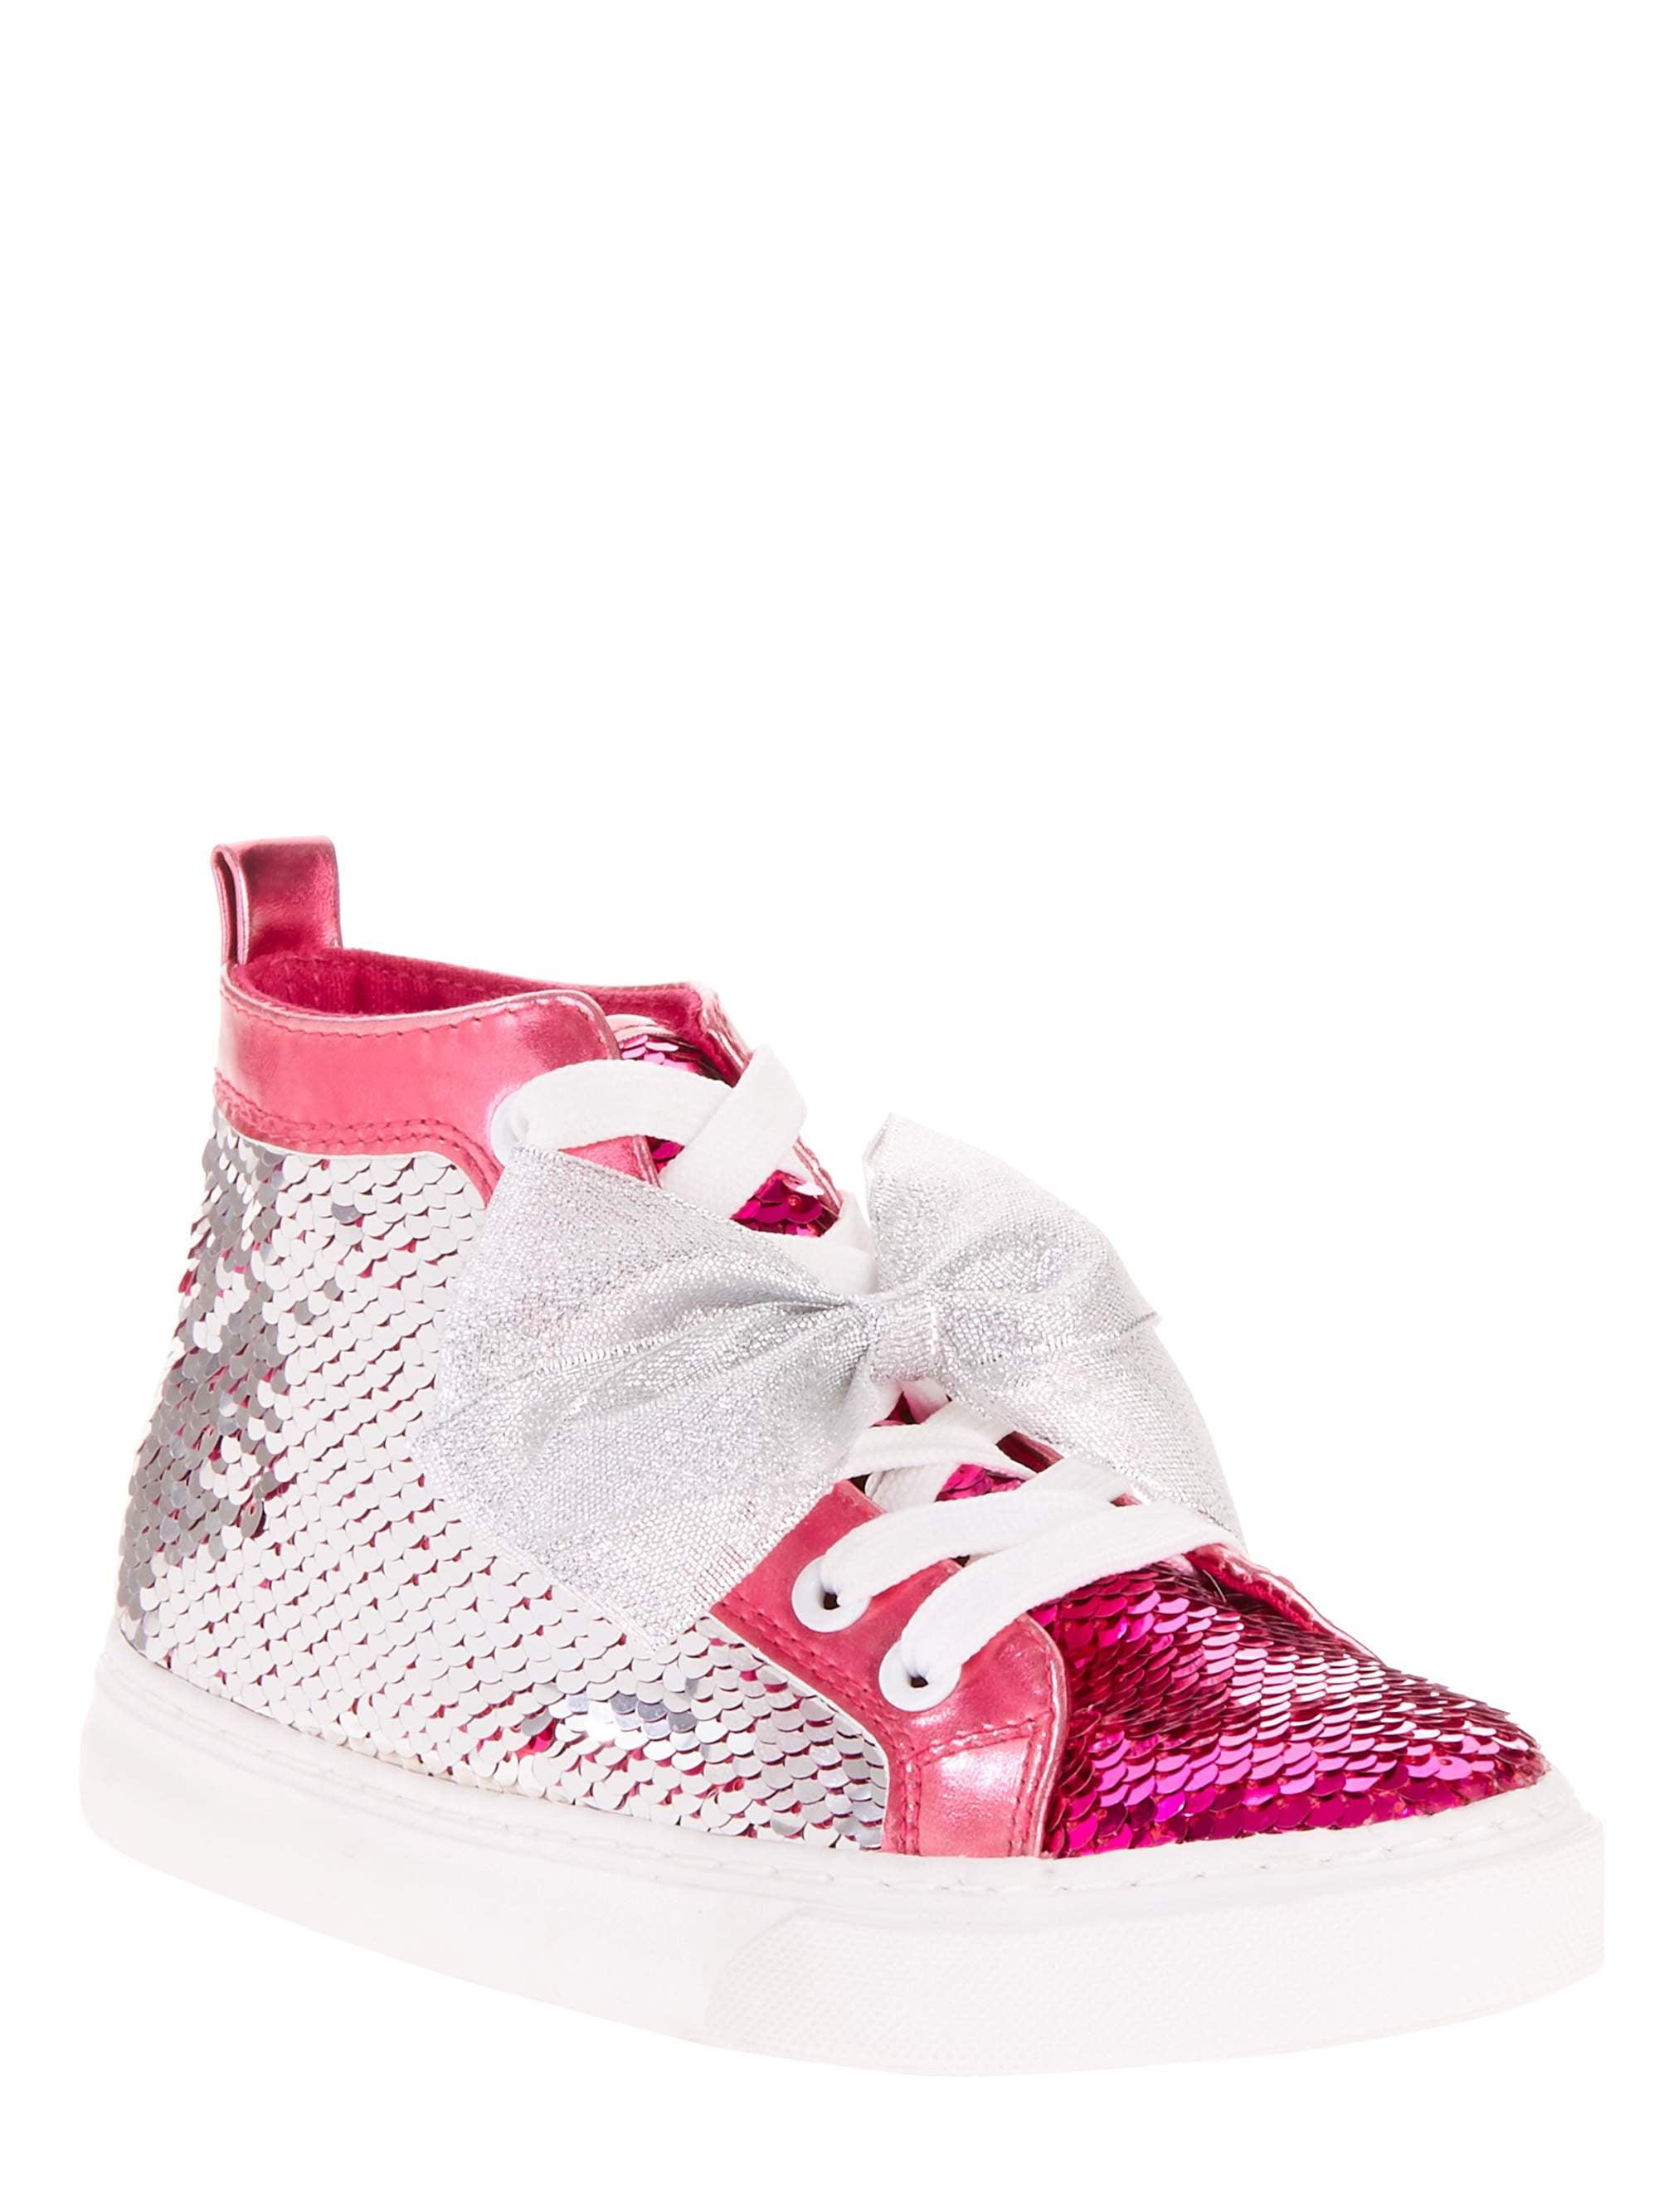 601b3b39c677b JOJO SIWA - Jojo Siwa Girl s Reverse Sequin Silver and Pink Bow High Top  Sneaker - Walmart.com